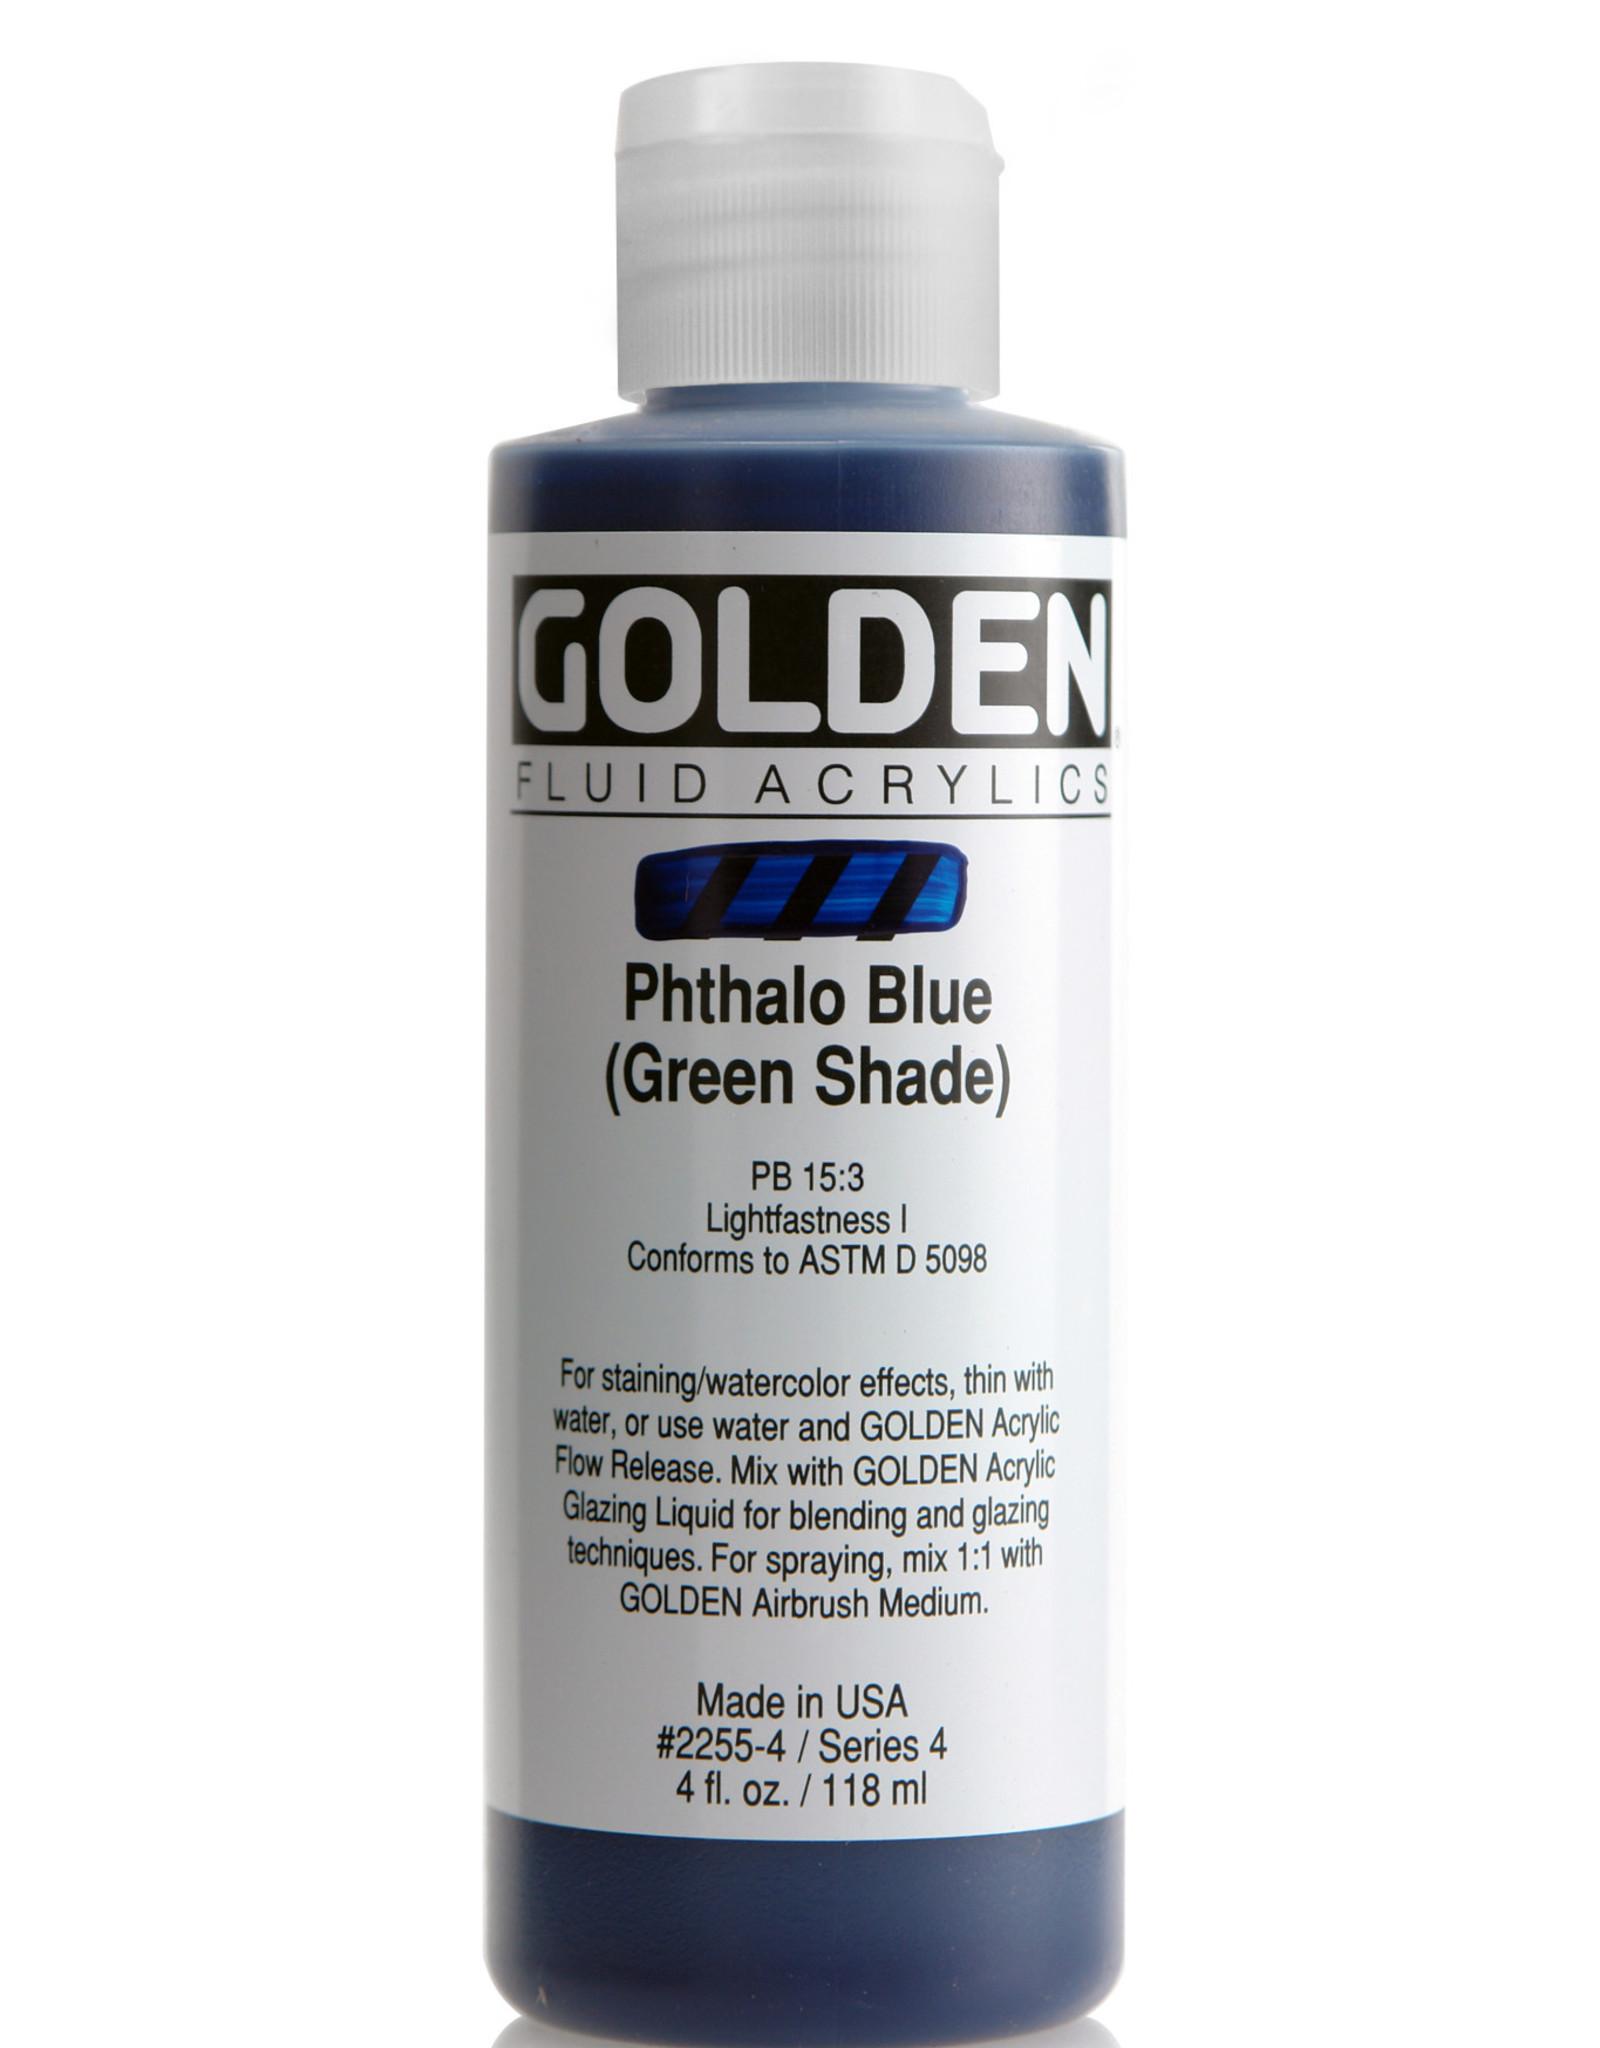 Golden Fluid Acrylic Paint, Phthalo Blue (Green Shade), Series 4, 4fl.oz, Bottle